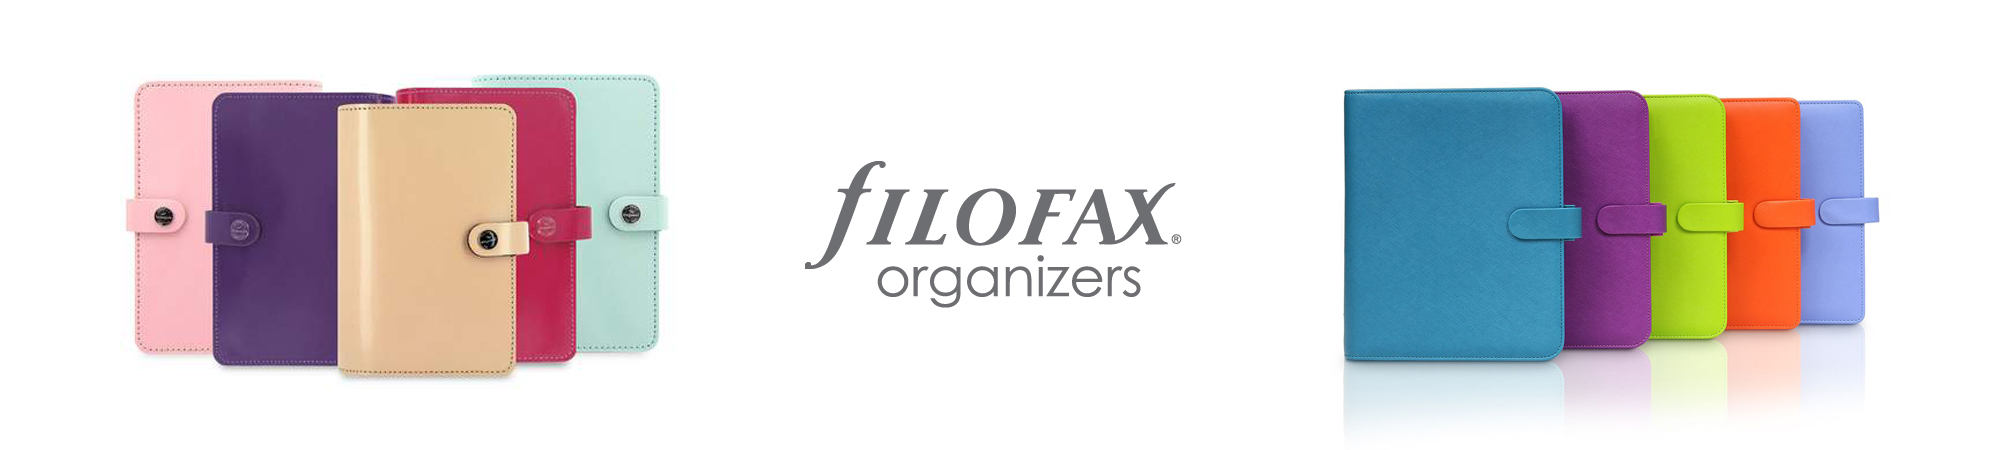 filofax original